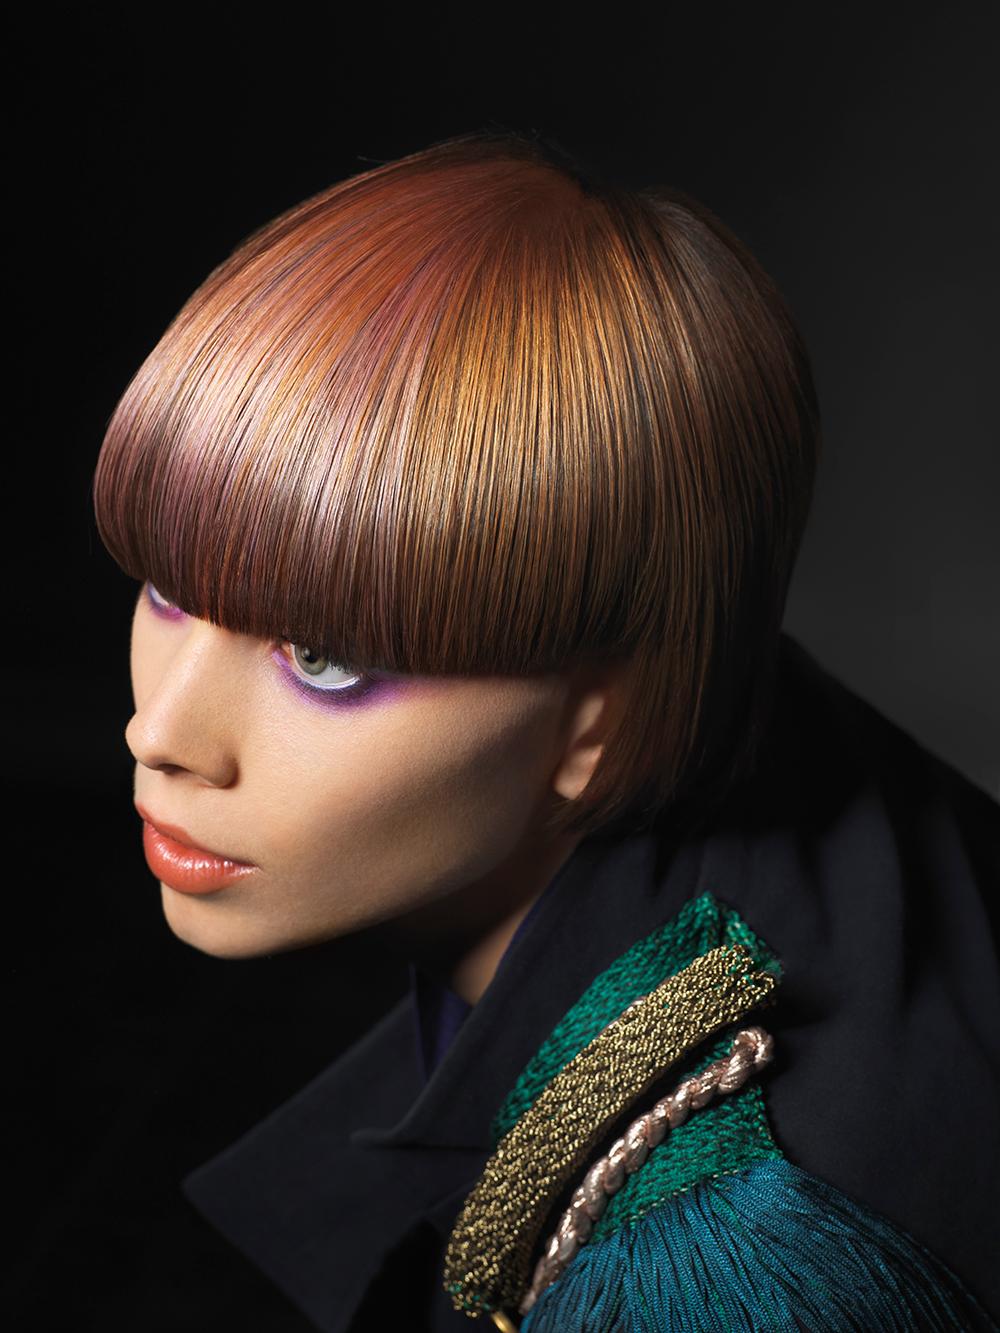 Hair Retouch 4 by Ashish-Arora on DeviantArt